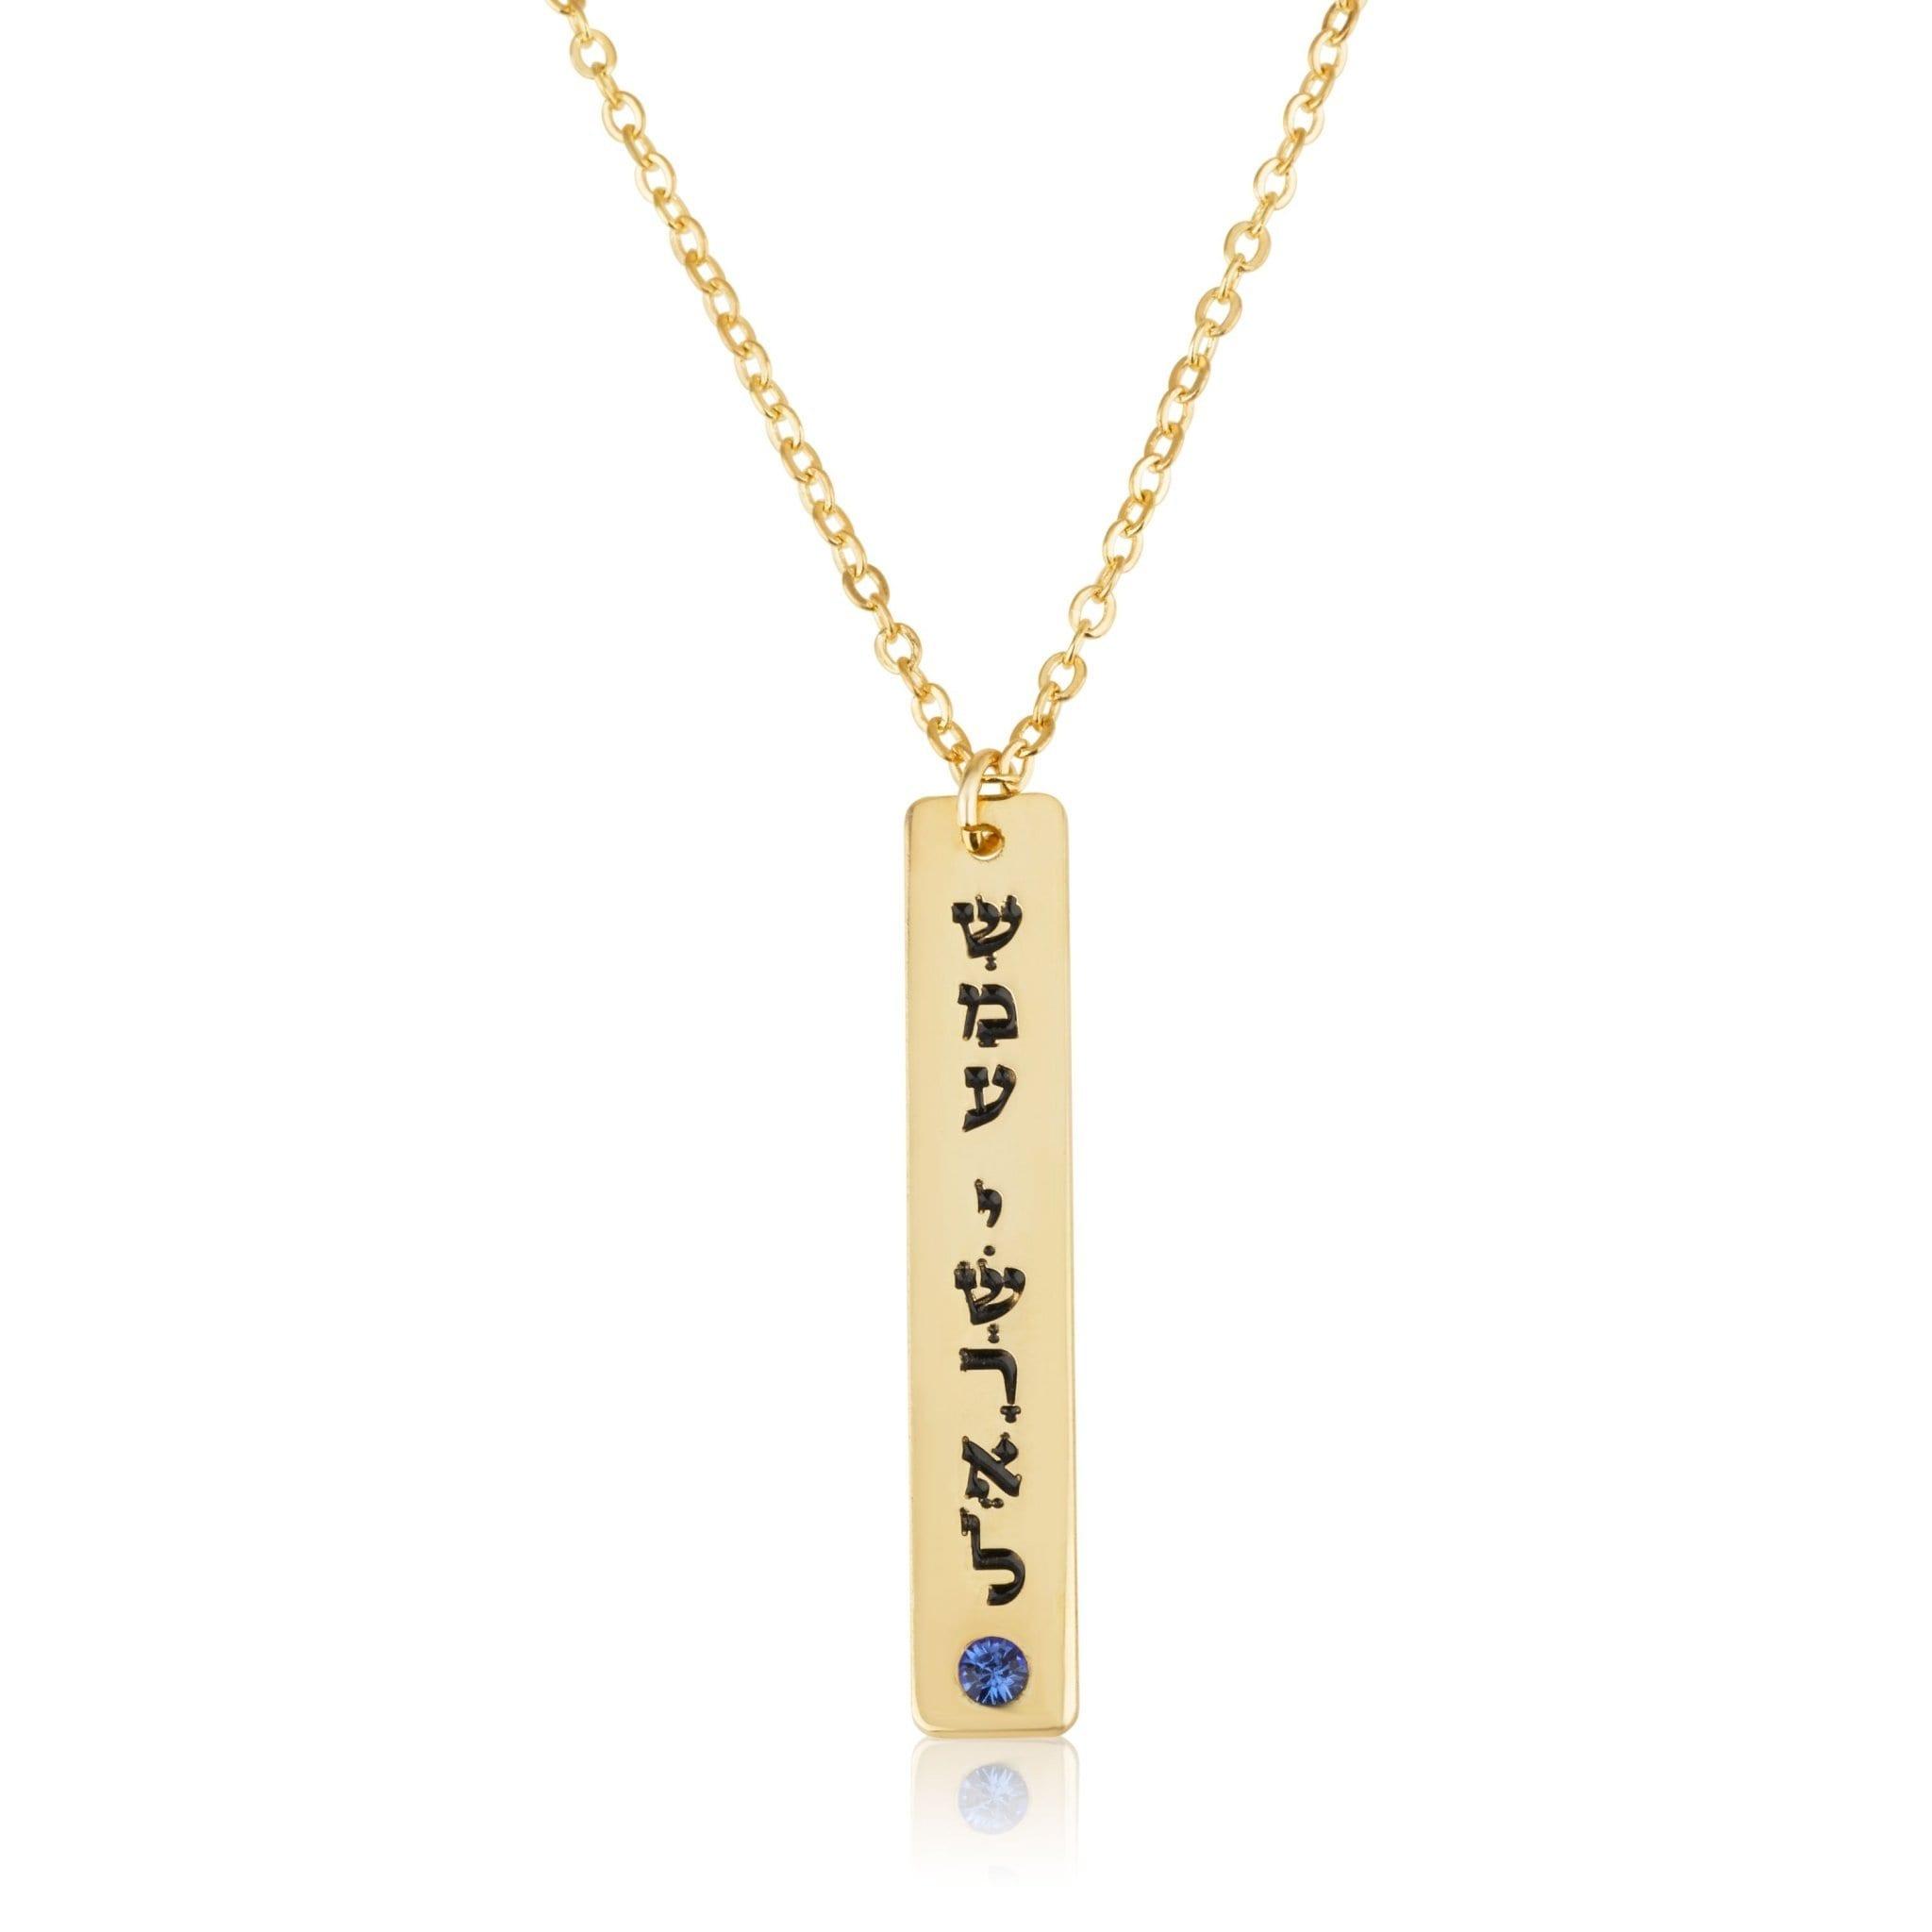 Shema Israel Necklace With Birthstone - שמע ישראל - Beleco Jewelry